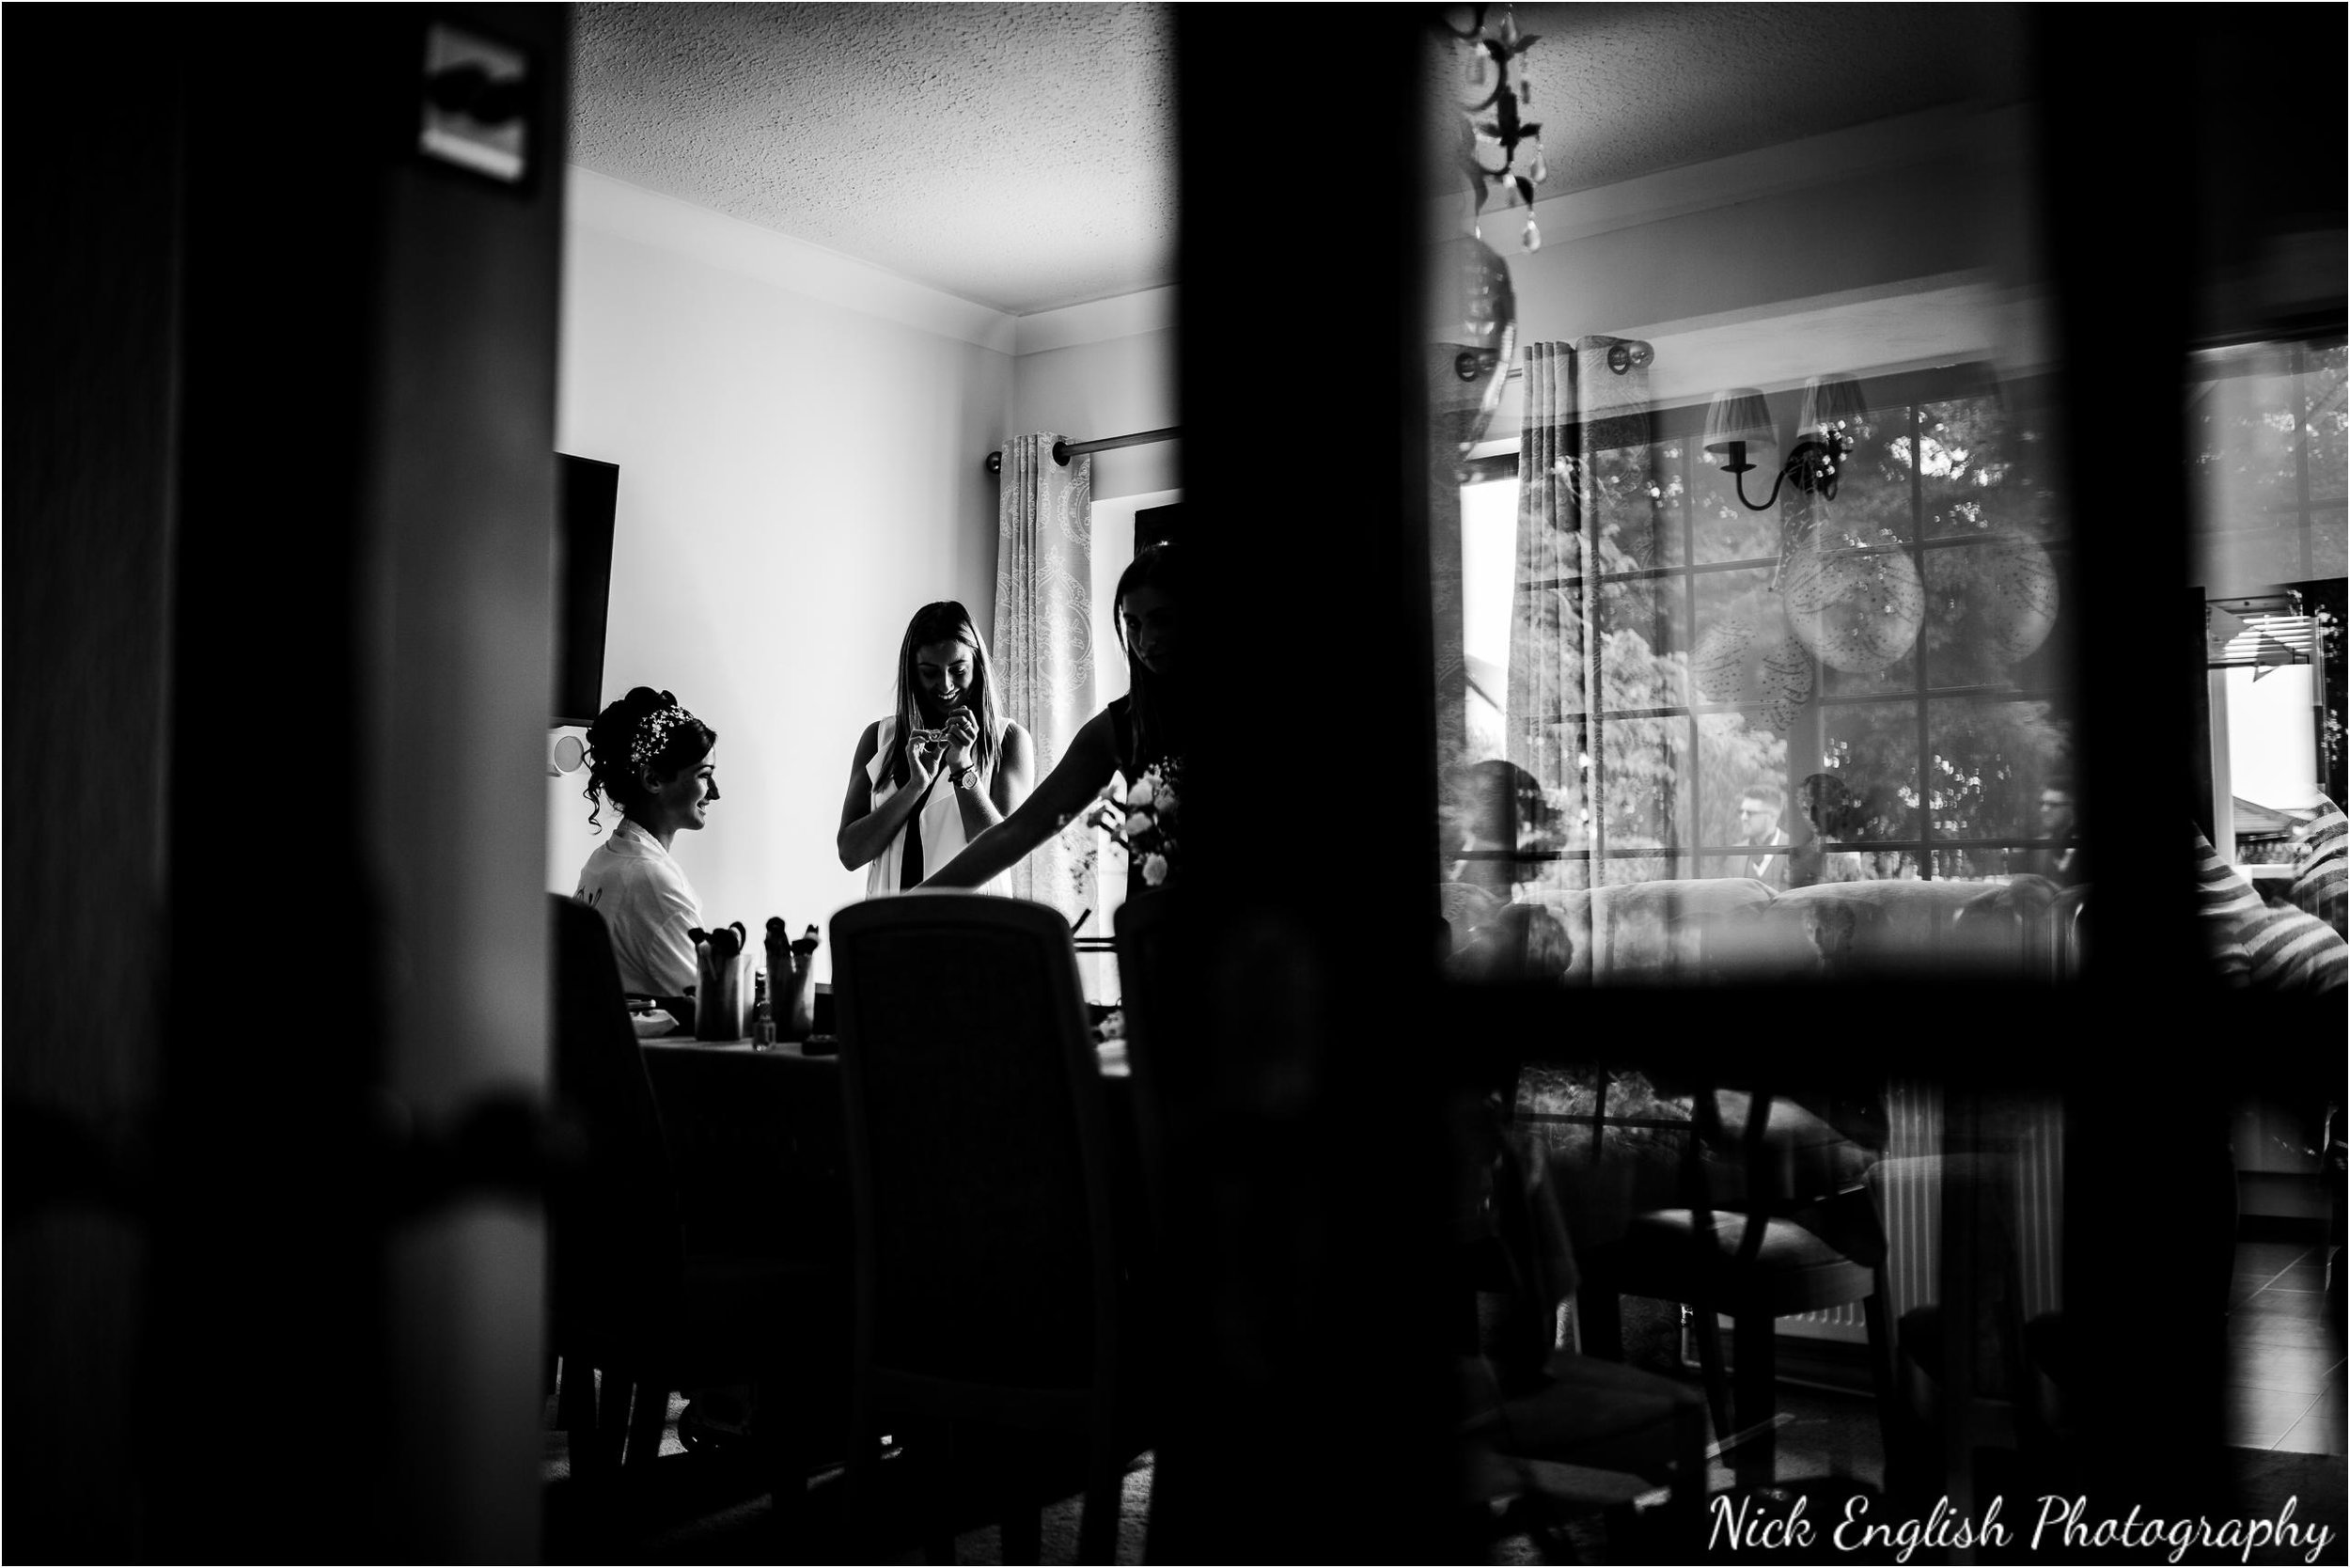 Emily David Wedding Photographs at Barton Grange Preston by Nick English Photography 14jpg.jpeg